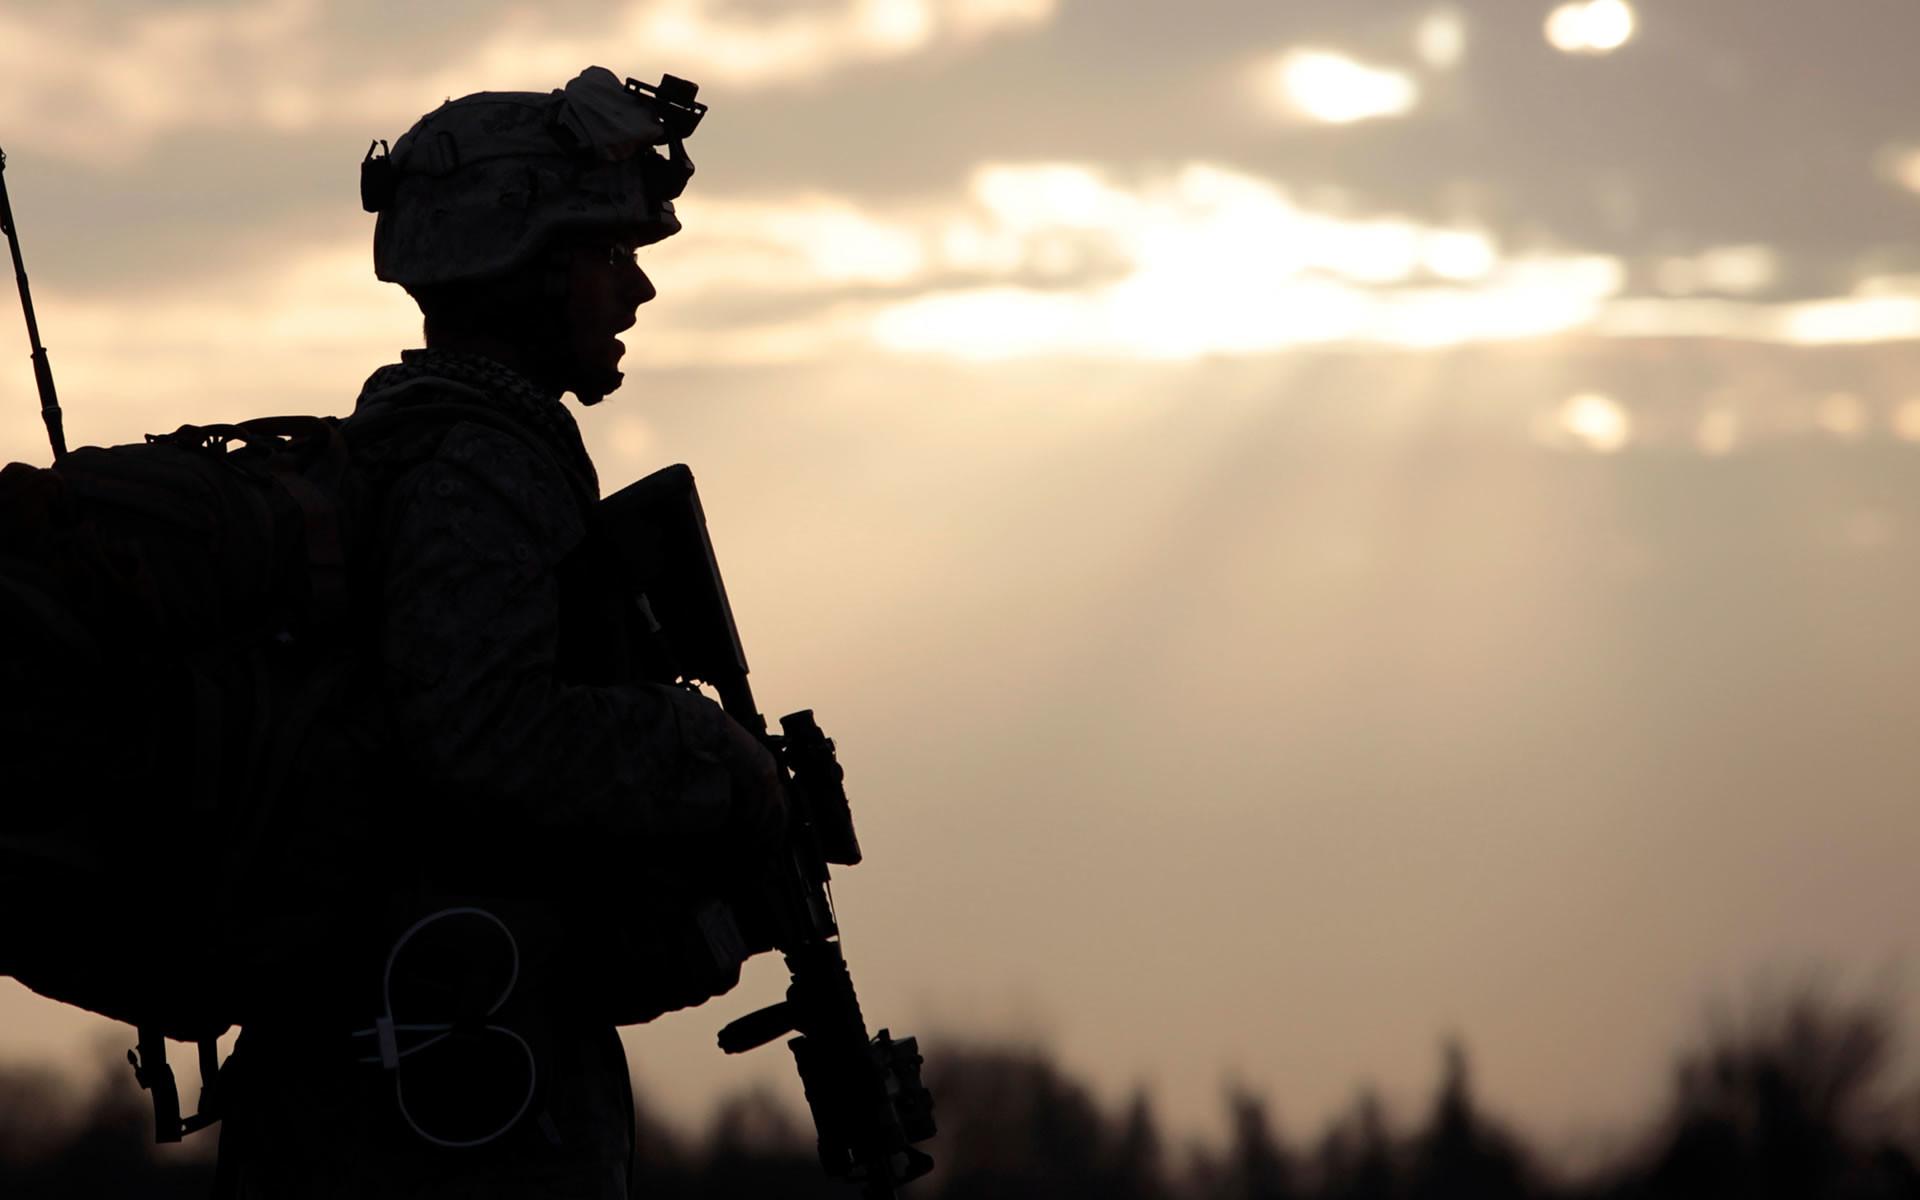 Res: 1920x1200, American Soldier in Afghanistan